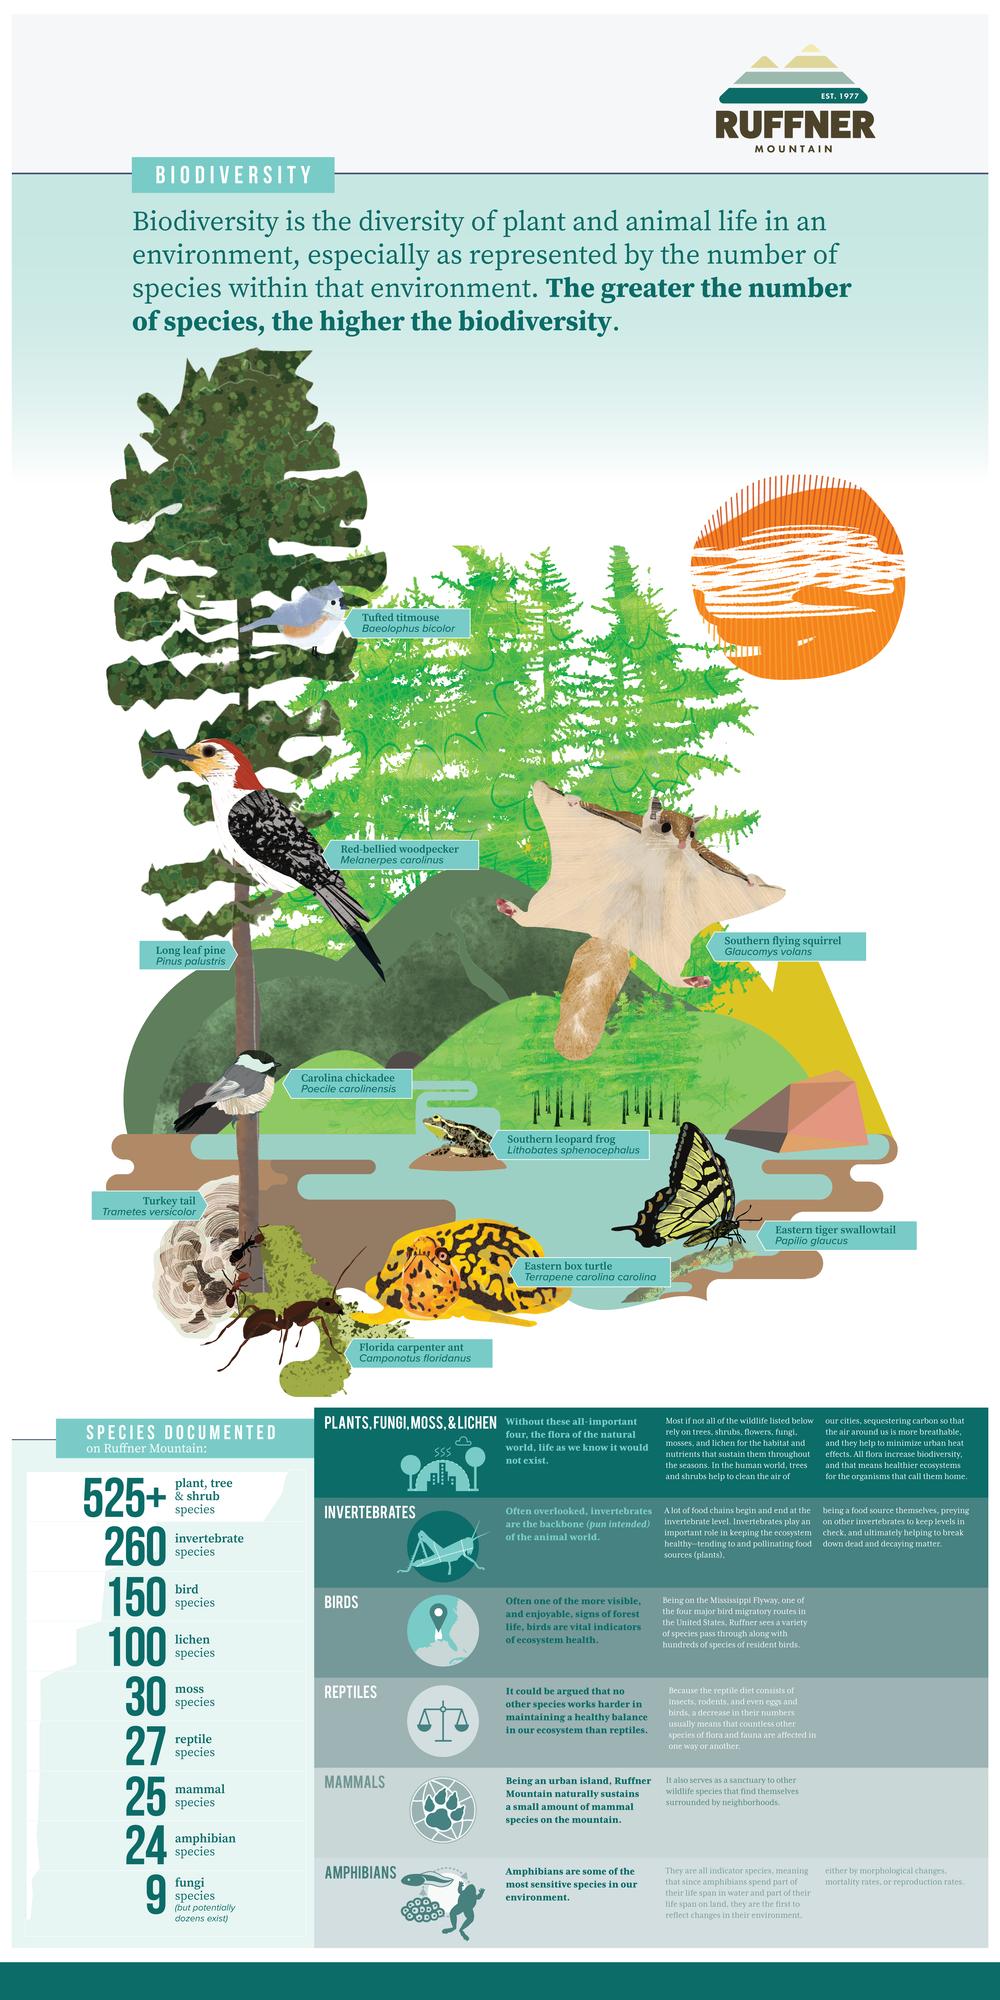 Ruffner_BiodiversityInfographic-Final_18x36.png